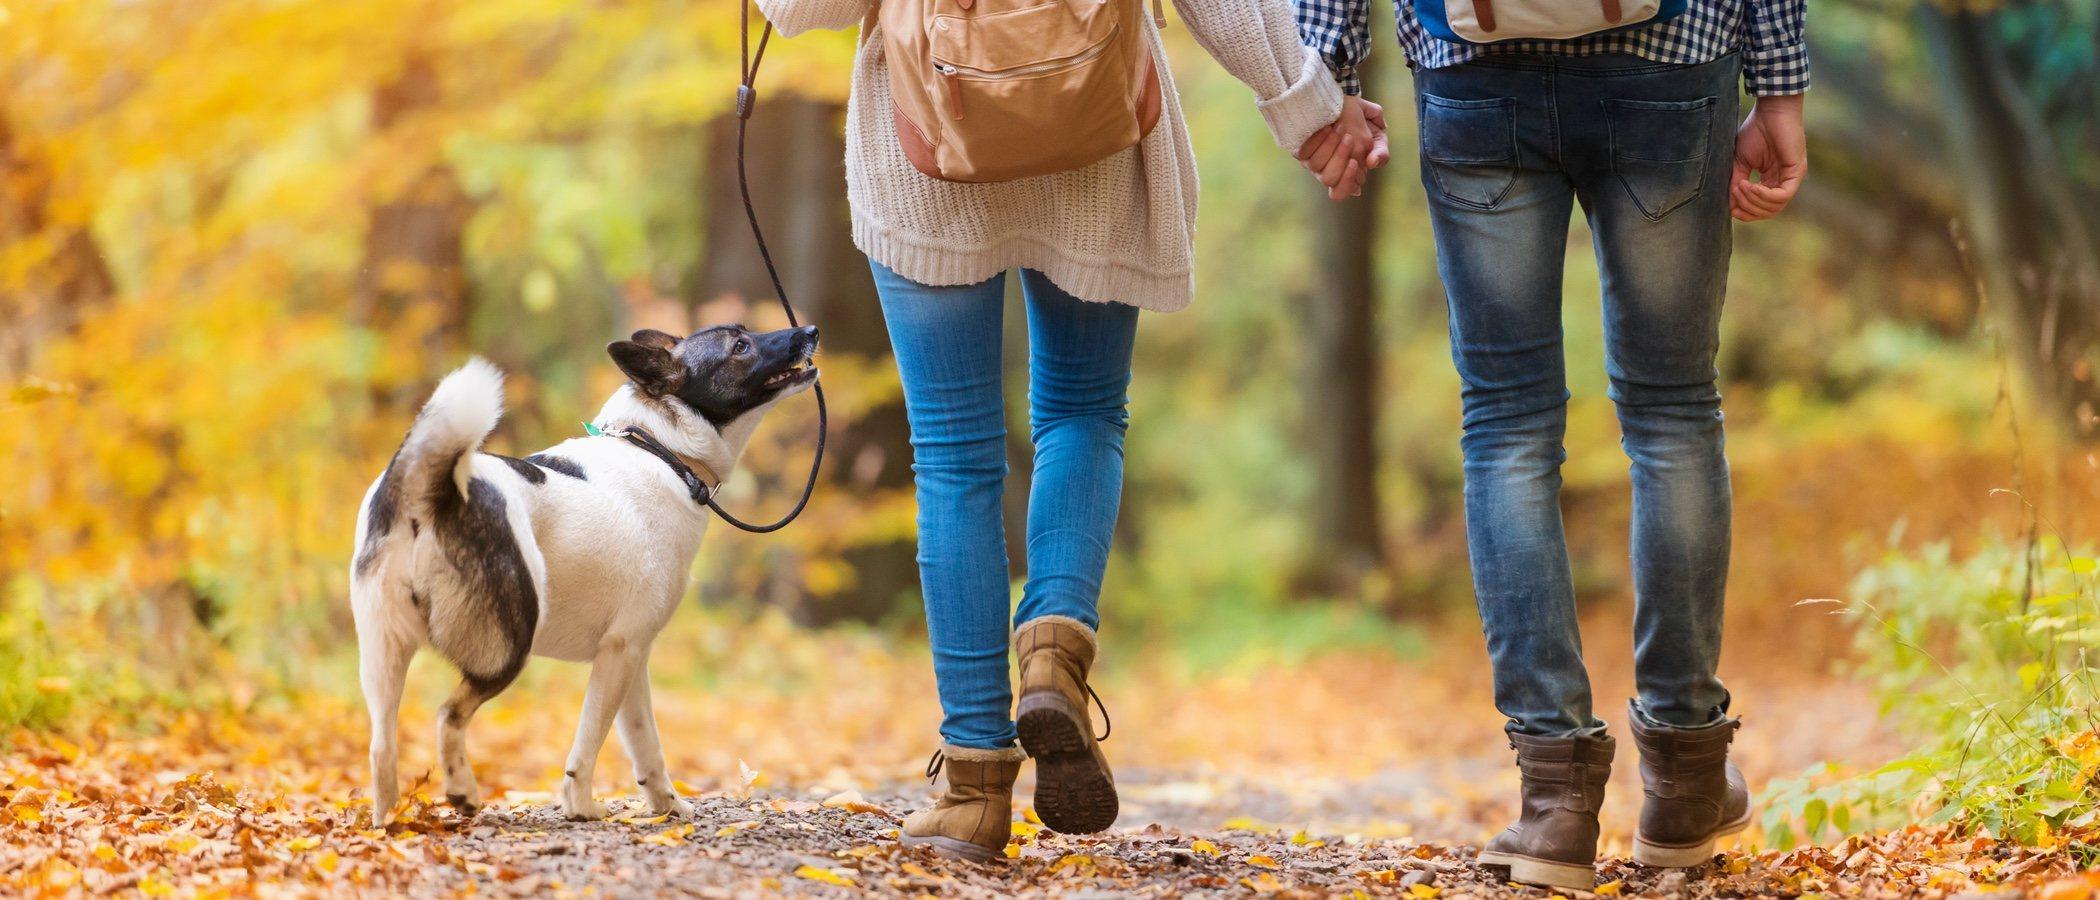 Cómo pasear correctamente a un perro